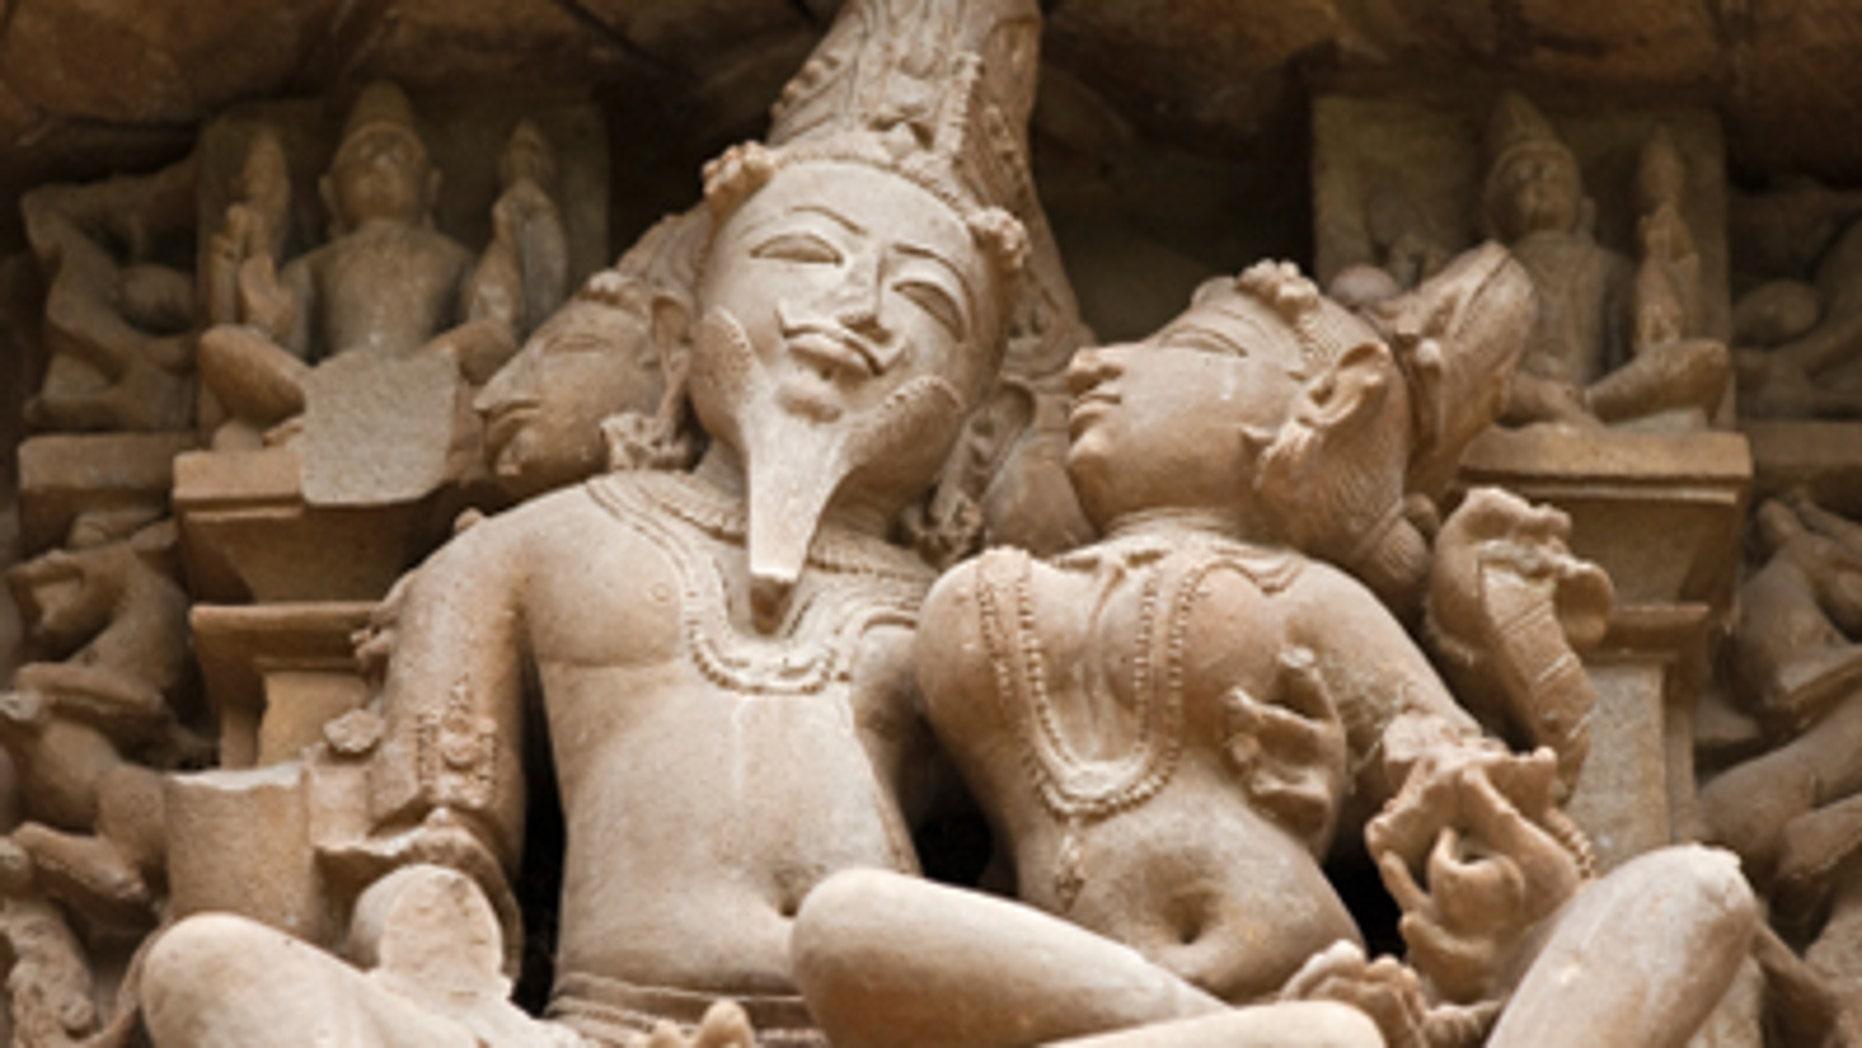 The statues of Khajuraho